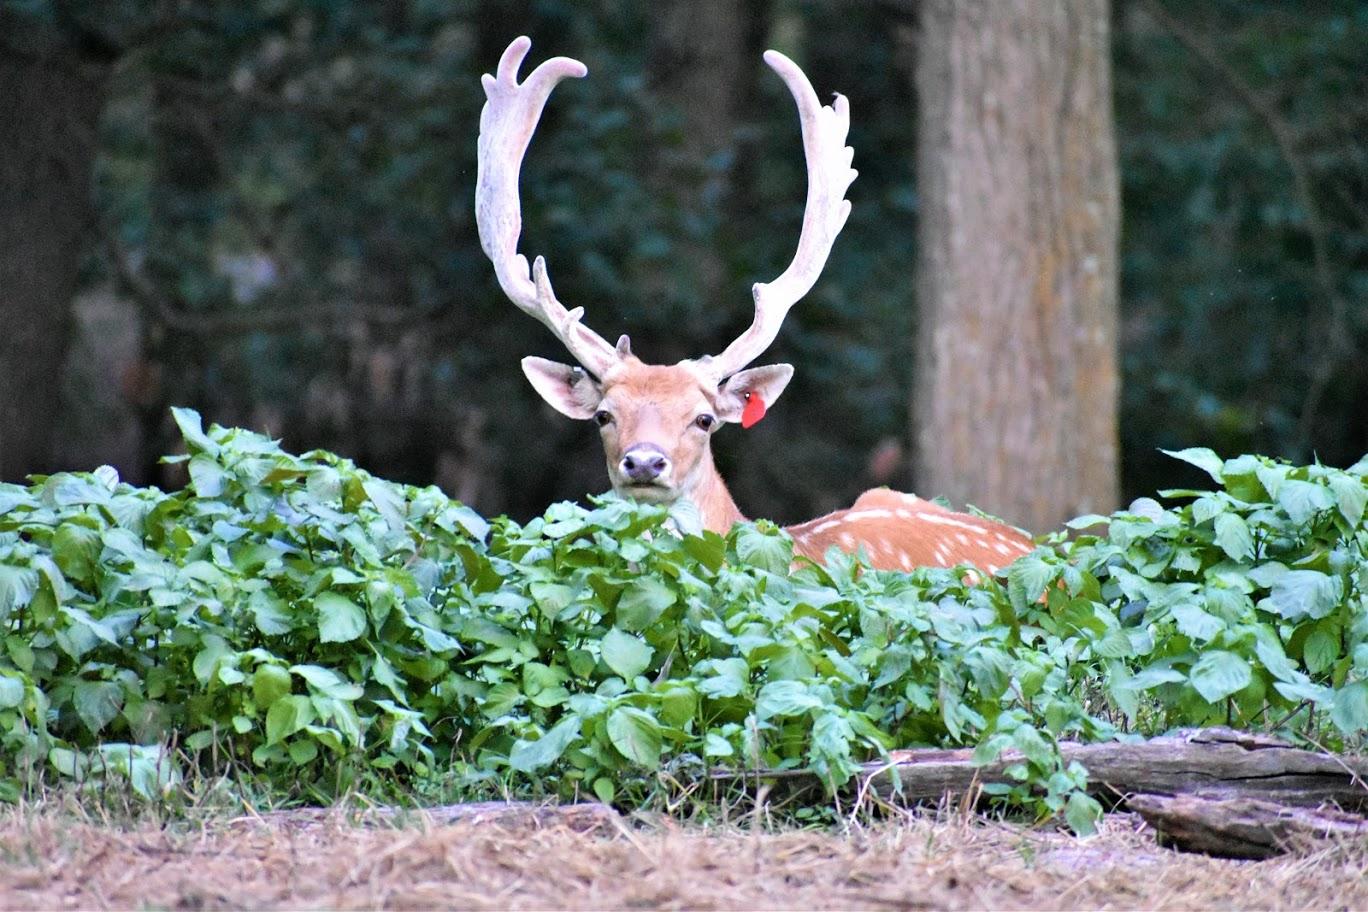 Deer with Great Antlers